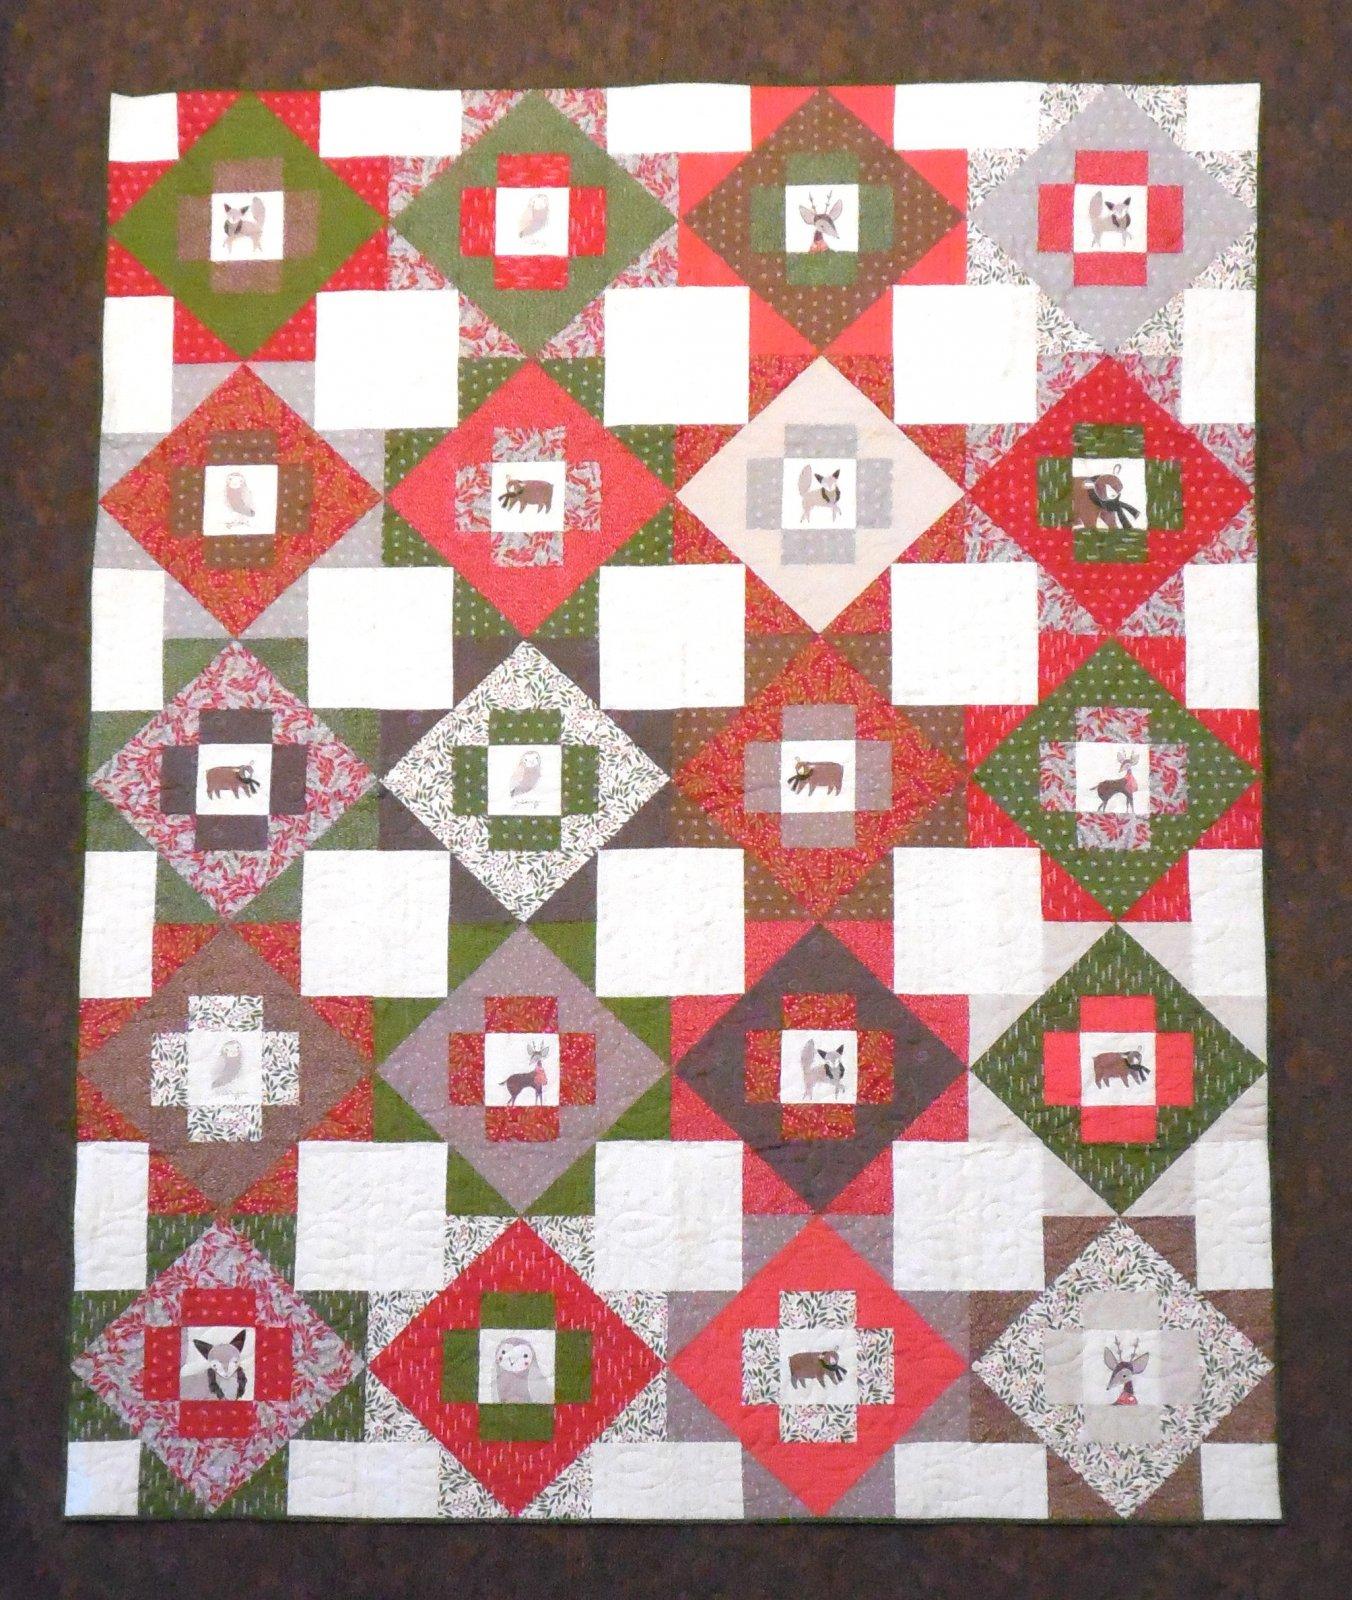 Merriment Finished Quilt 64 x 80